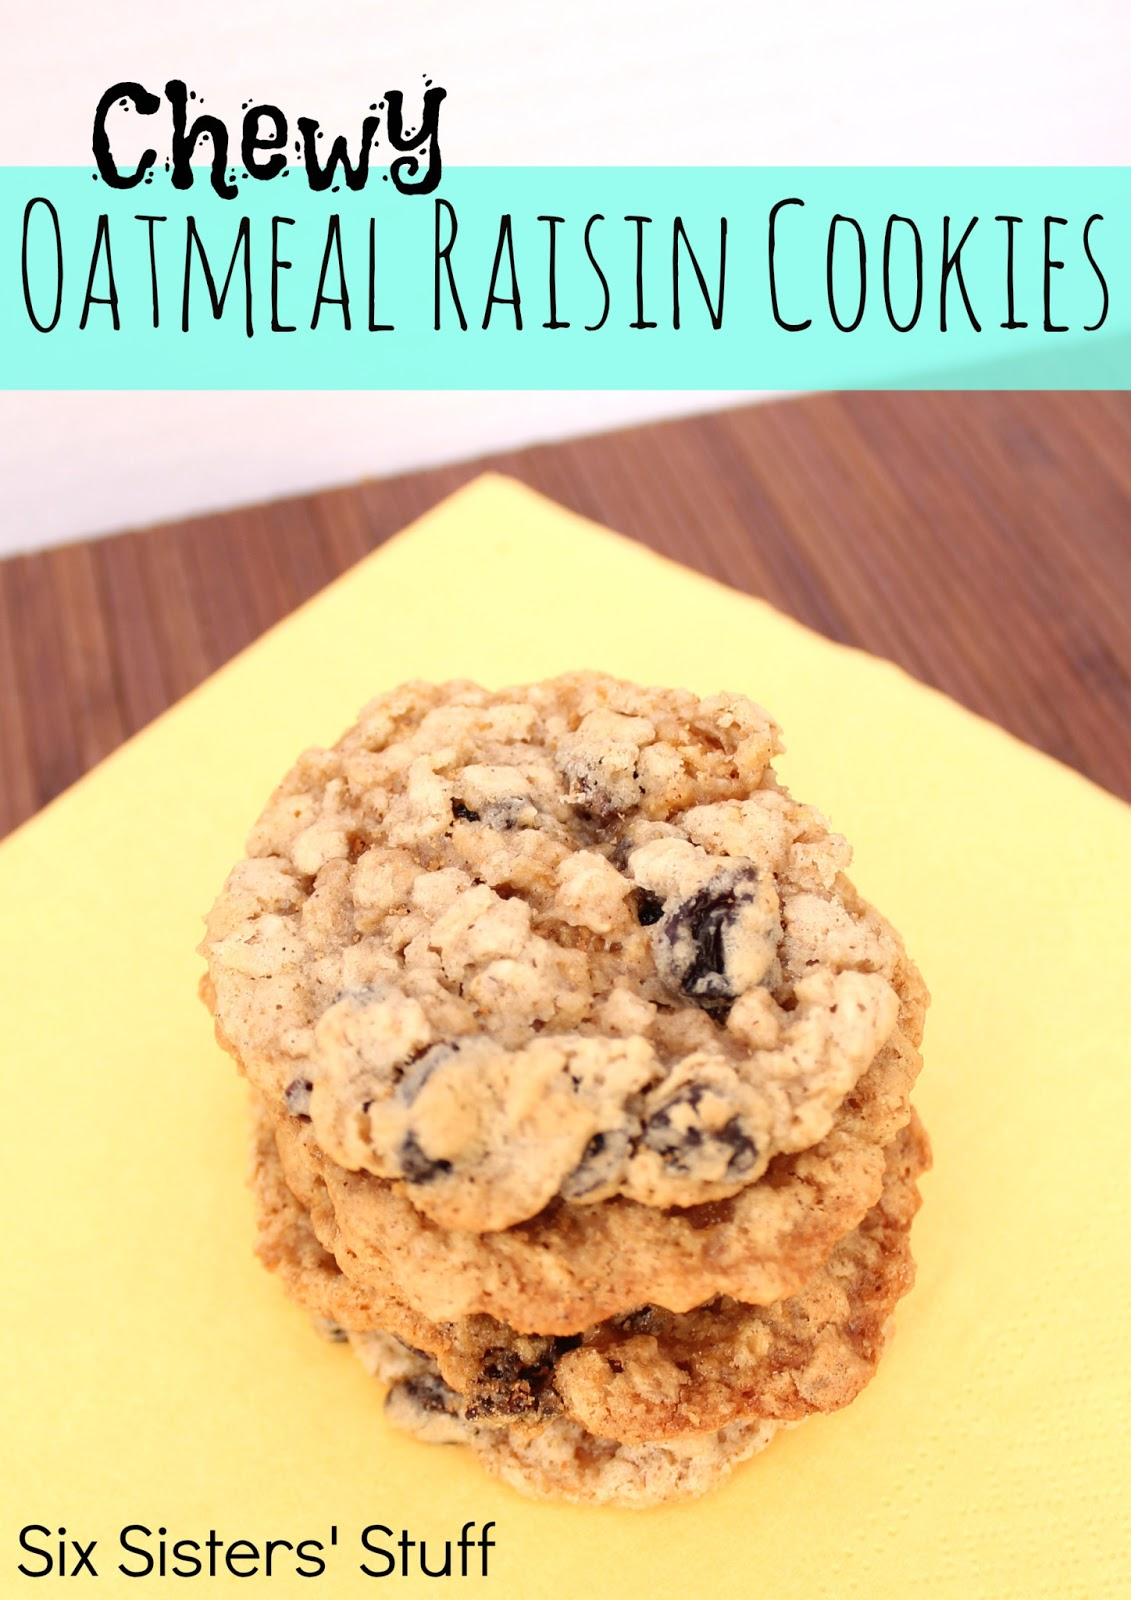 Chewy Oatmeal Raisin Cookies Recipe | Six Sisters' Stuff